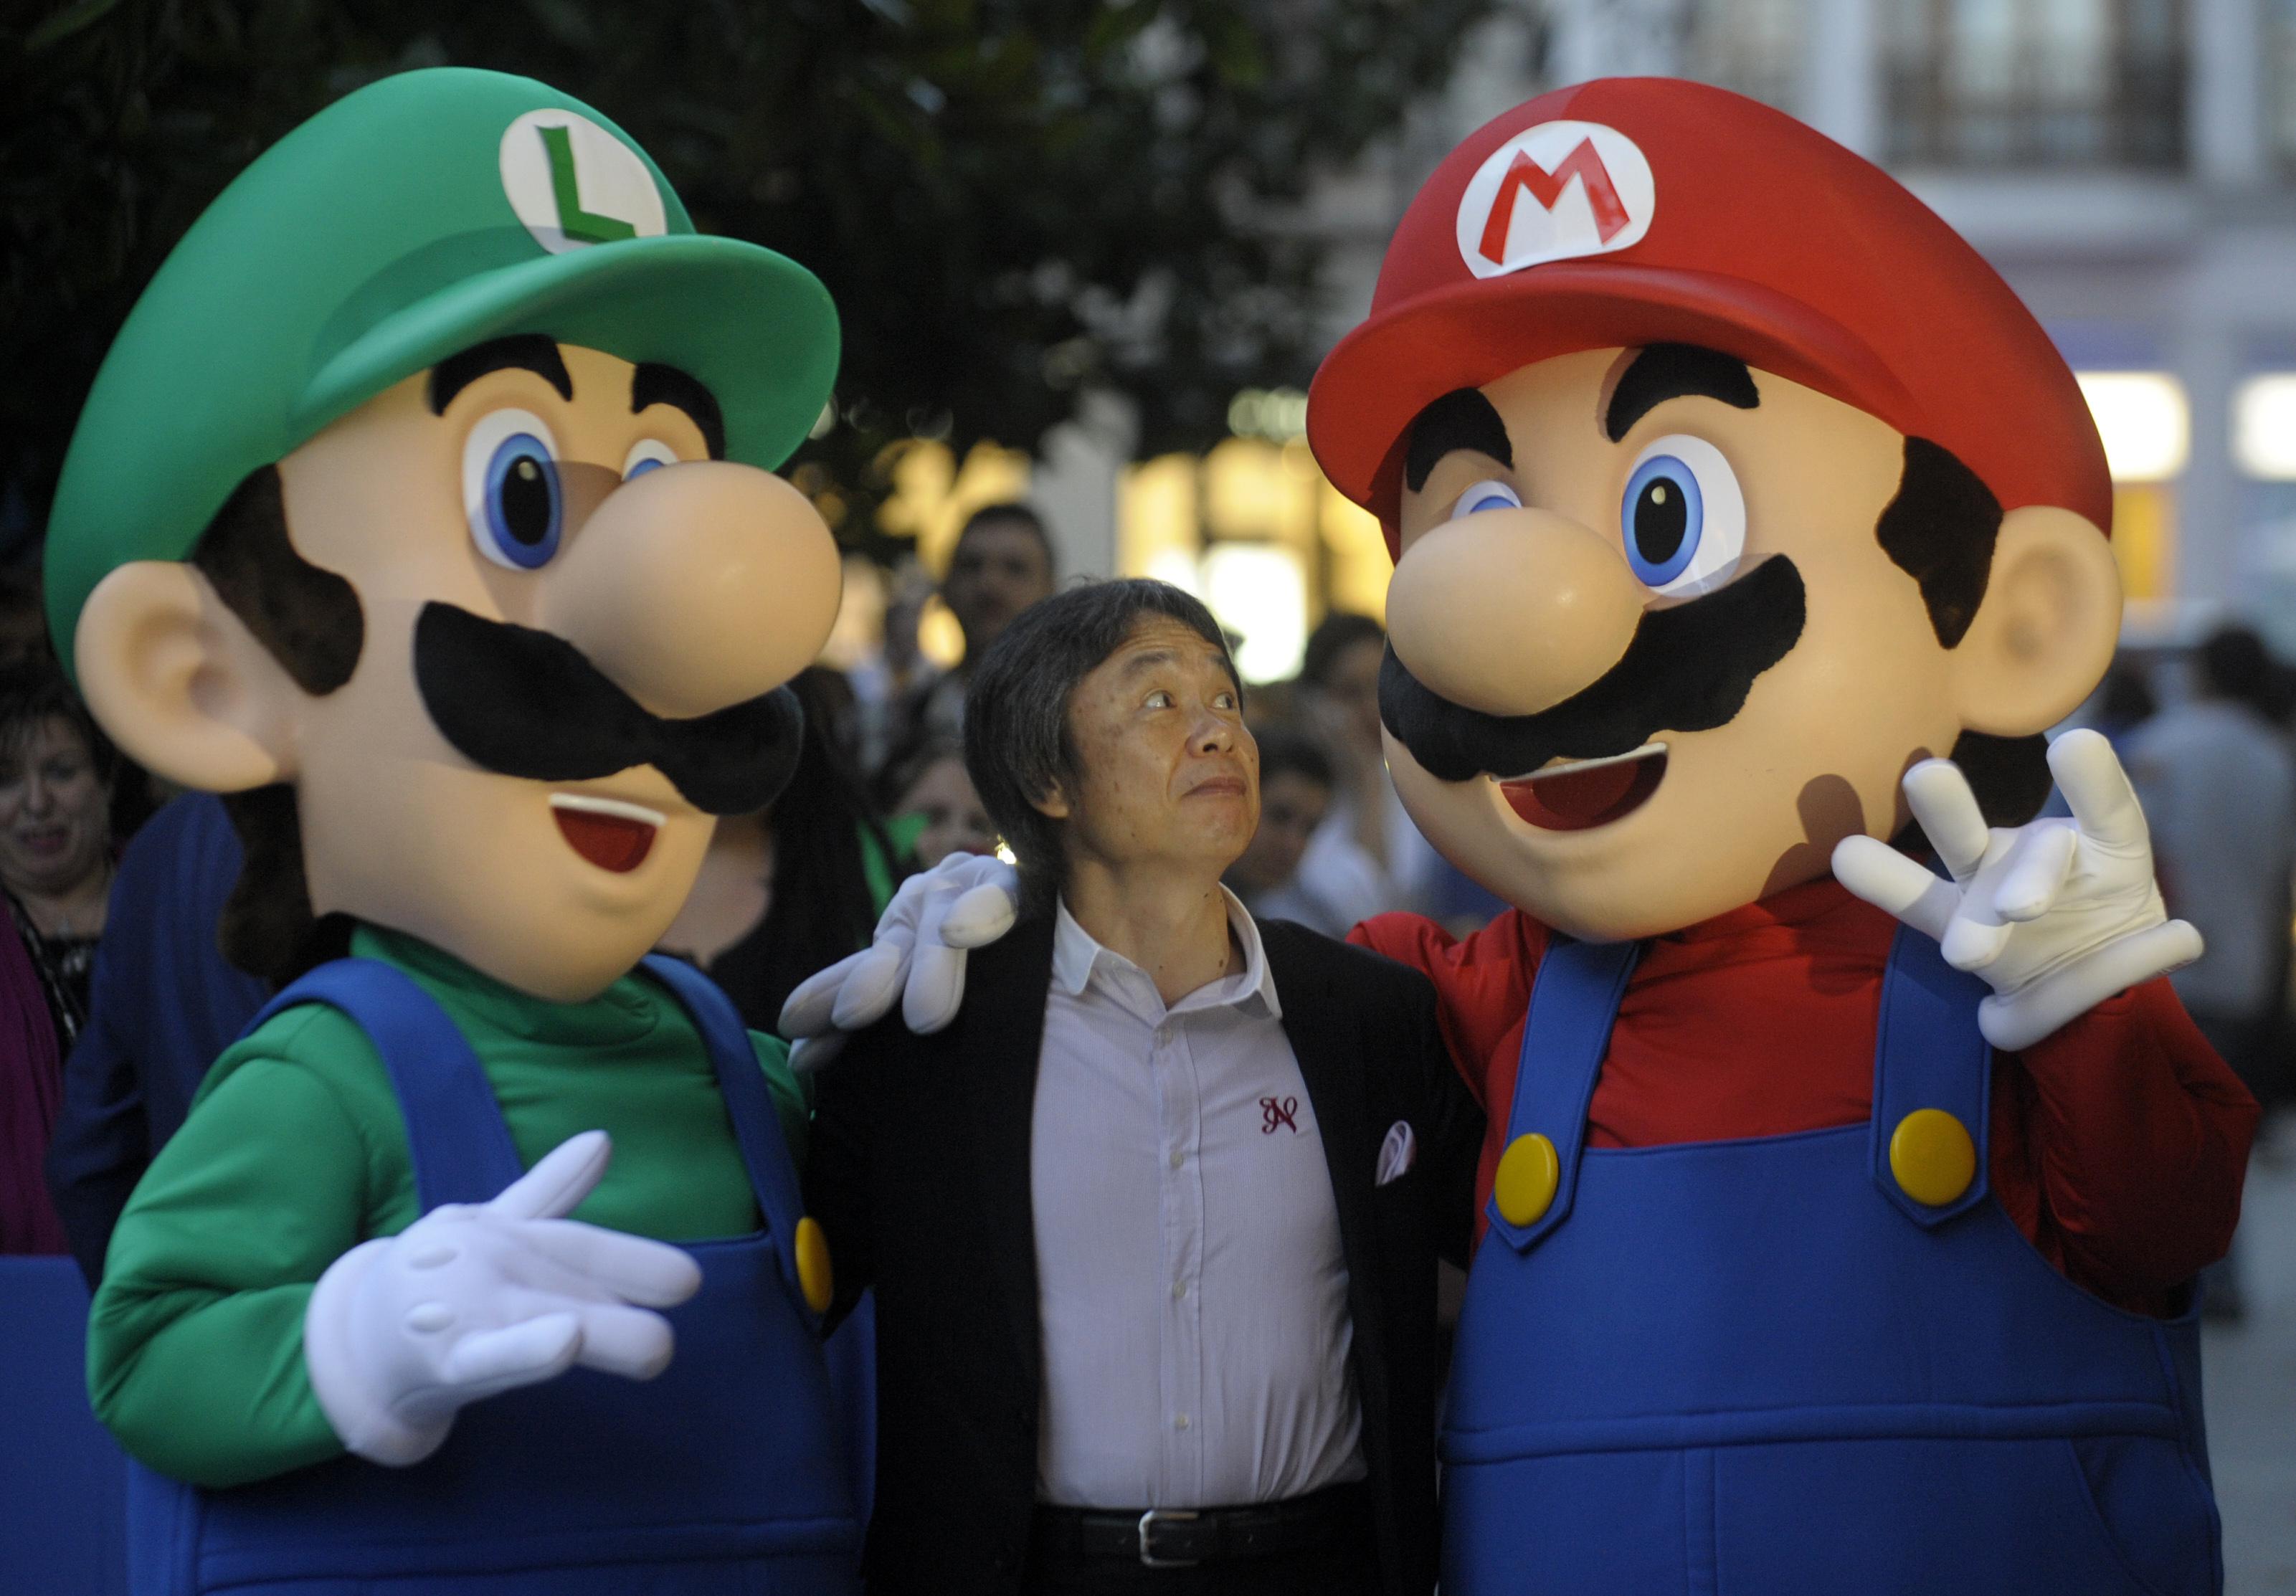 Nintendo designer and Mario co-creator Shigeru Miyamoto poses with the Mario Bros. at the Jovellanos Theatre in Gijon.